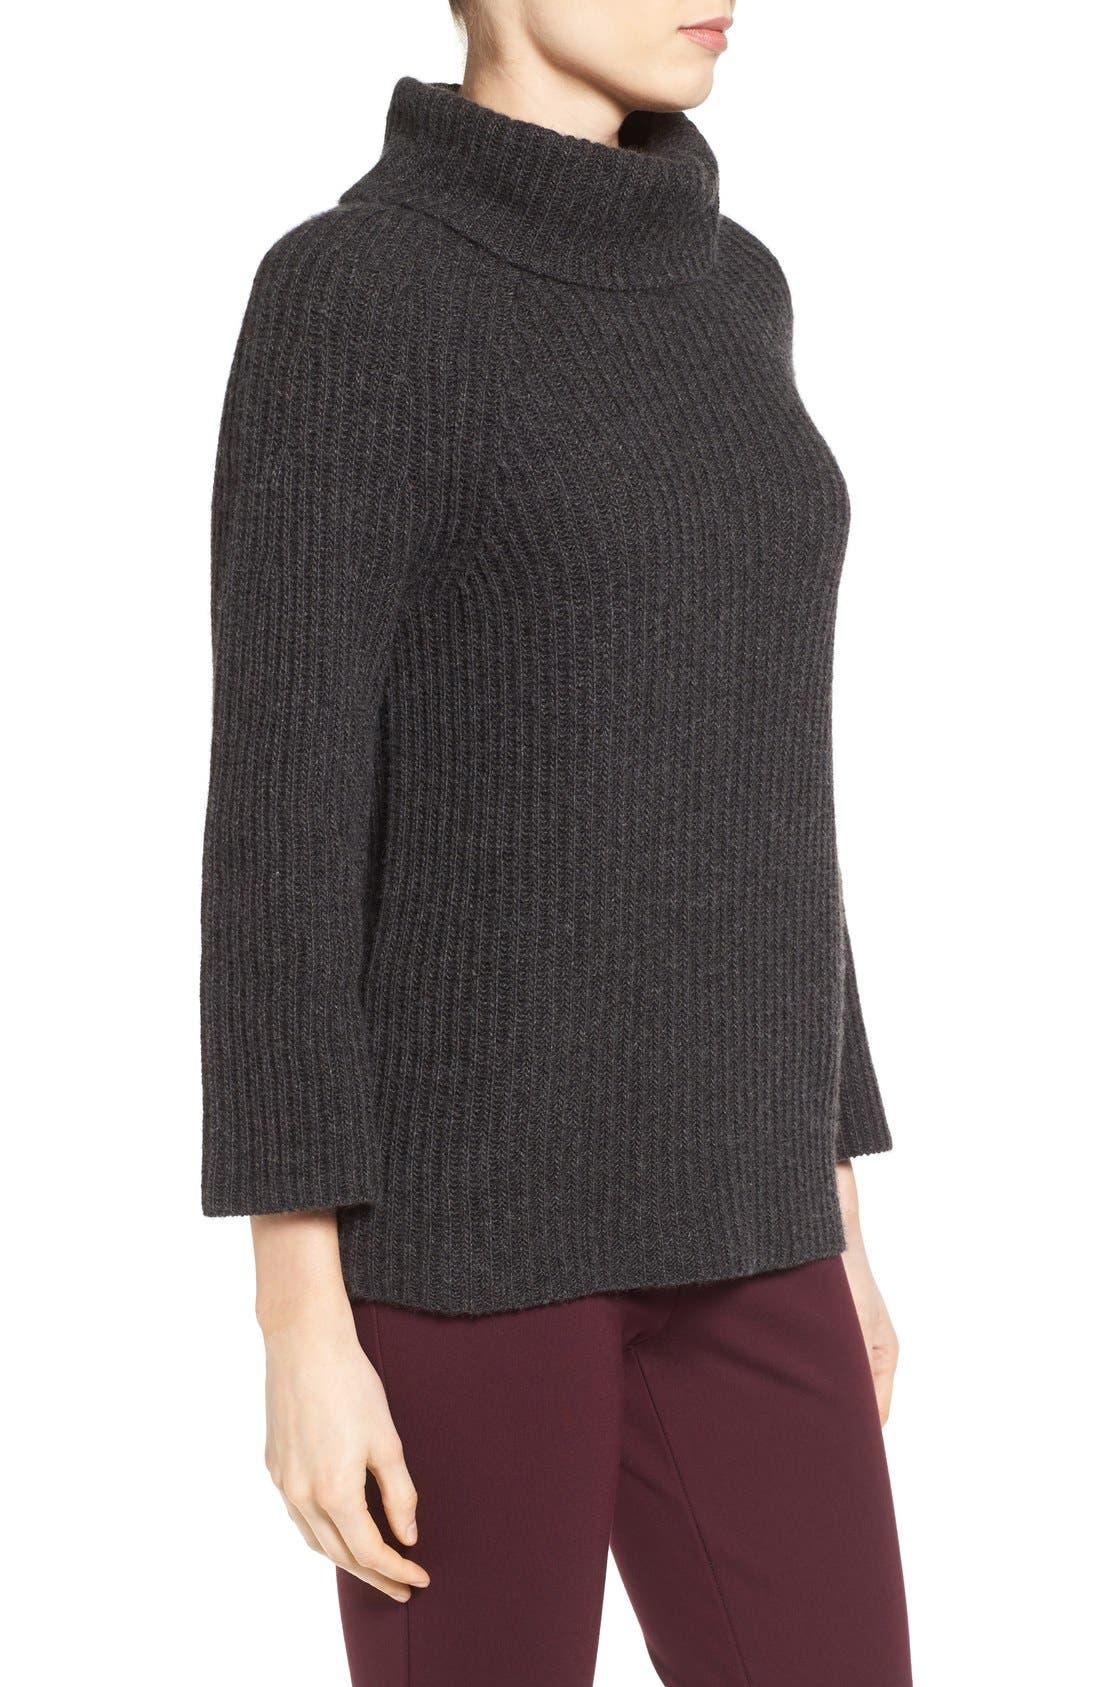 Ribbed Cashmere Turtleneck Sweater,                             Alternate thumbnail 4, color,                             021